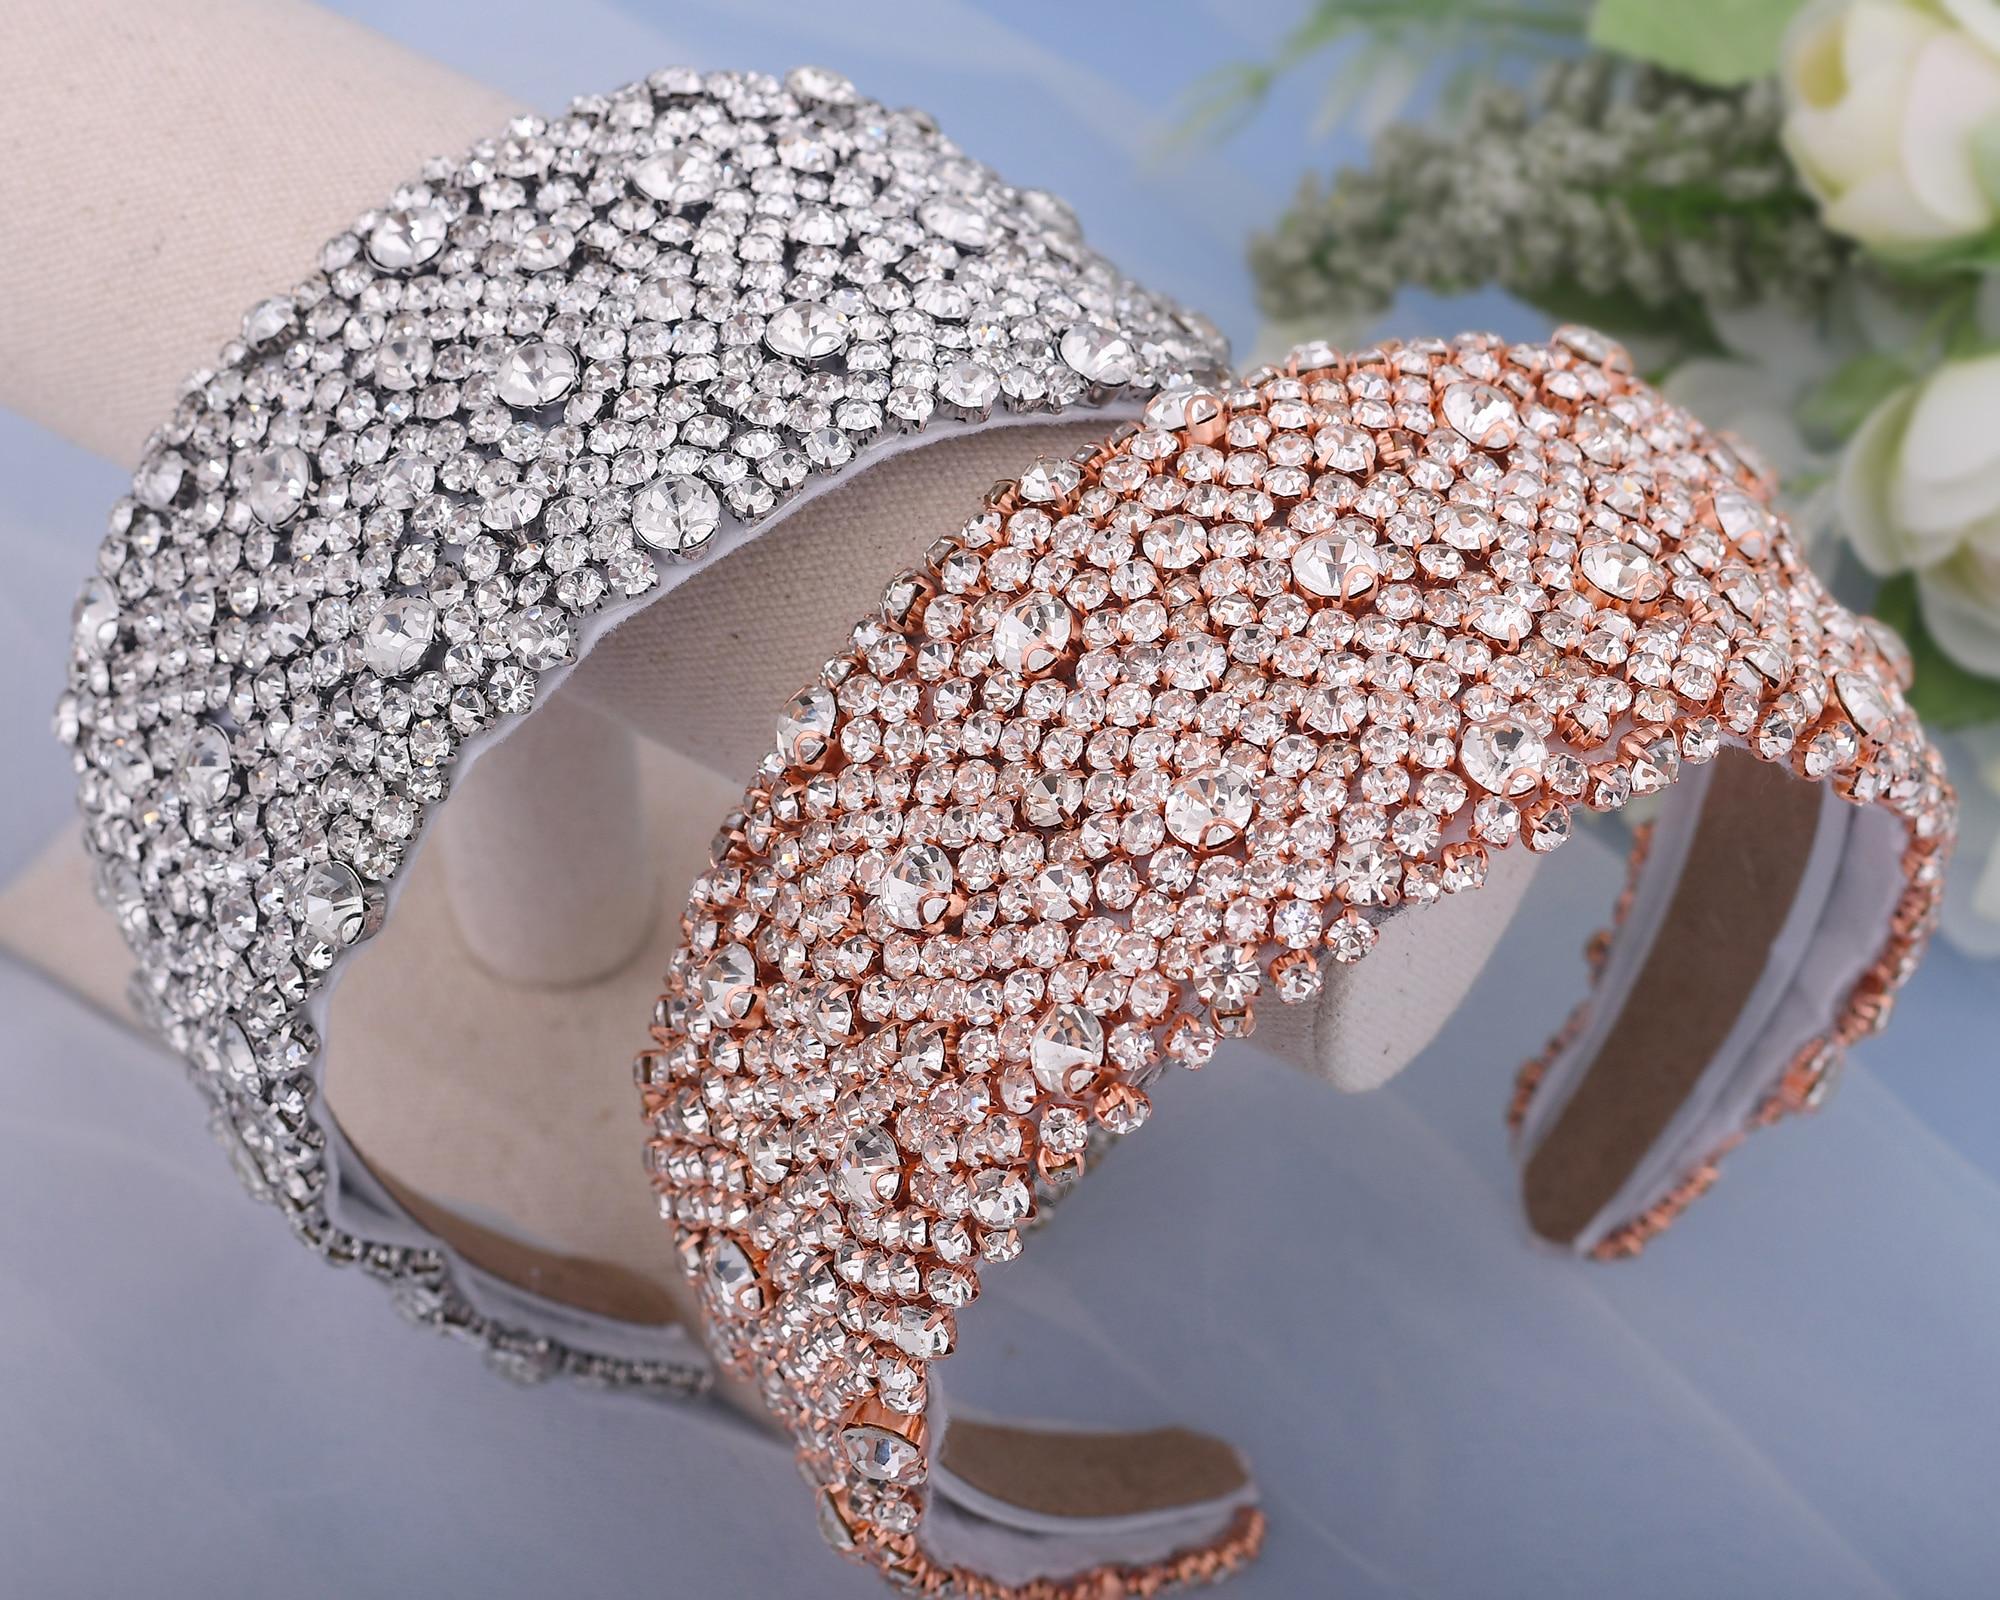 ZMHP363-إكسسوارات شعر العروس الفاخرة ، مع أحجار الراين والكريستال ، للزفاف ، والحفلات الراقصة ، وعقال هدية لصديقتك